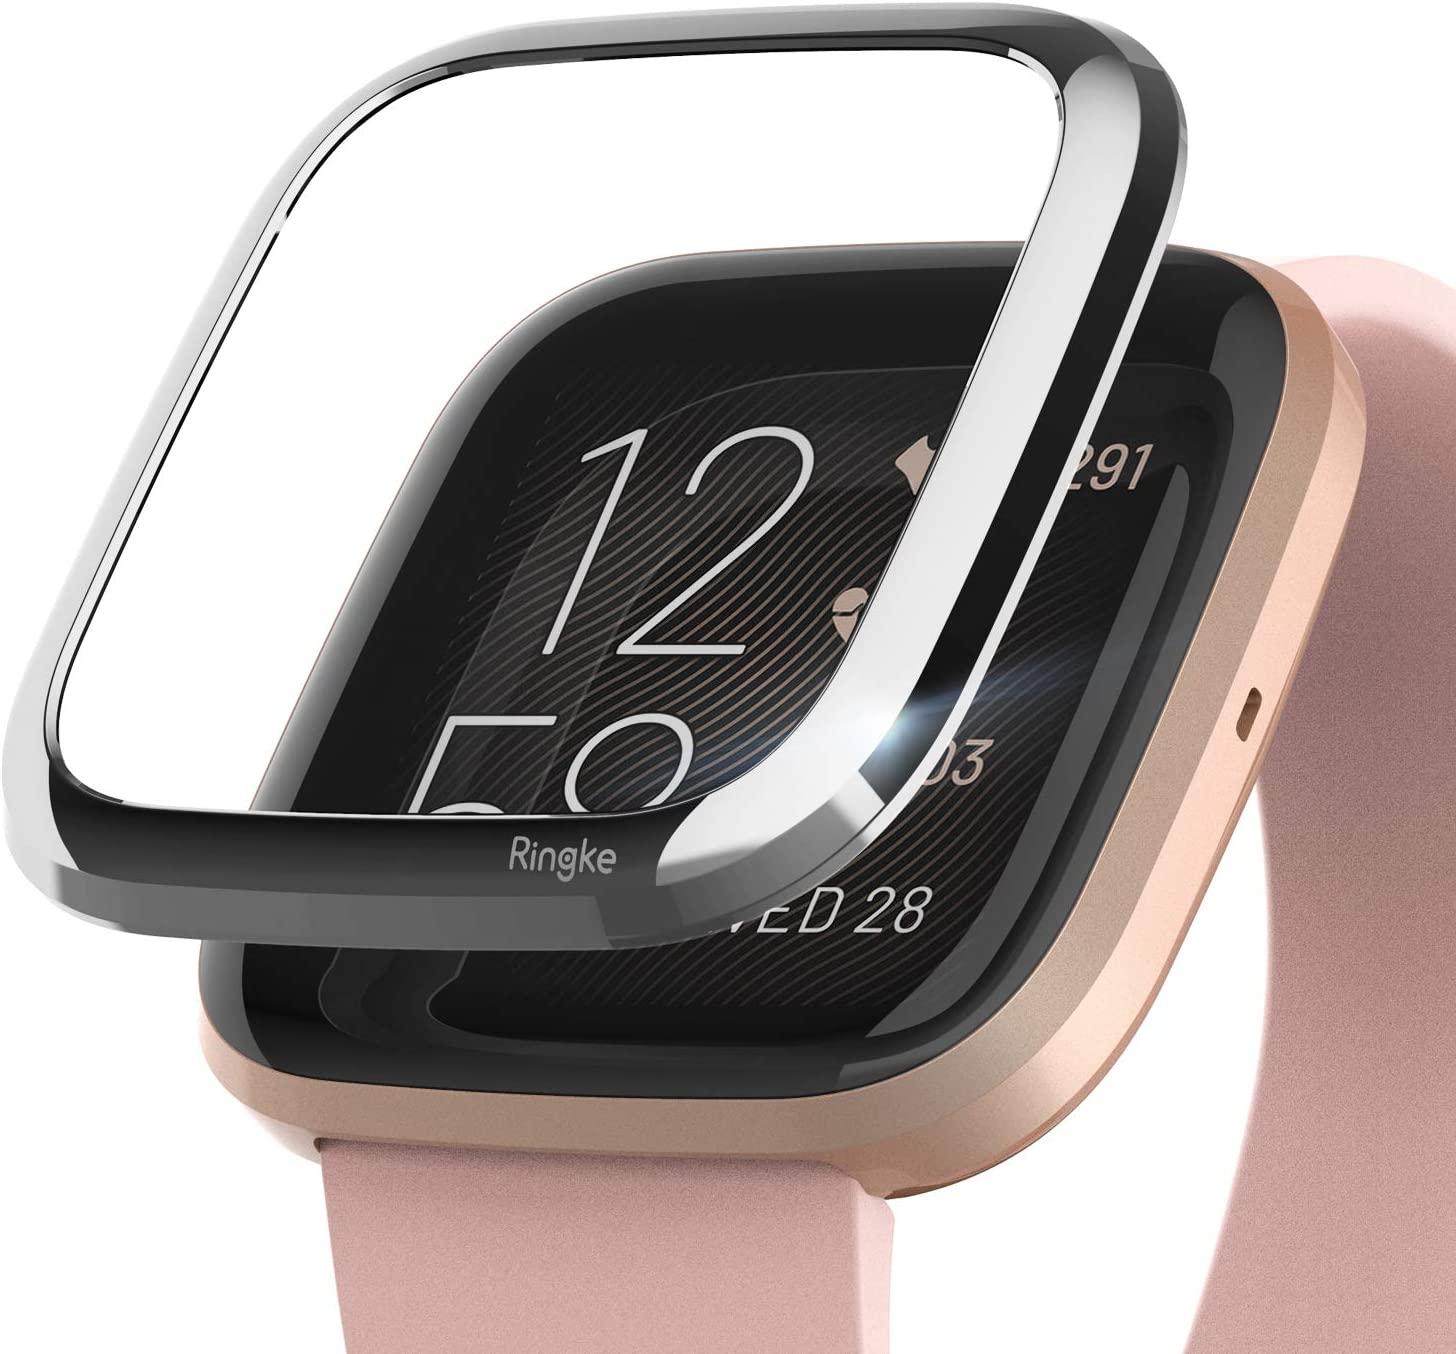 Ringke Bezel Styling Case Designed for Fitbit Versa 2 Full Stainless Steel Metal Frame Smartwatch Case Accessory - Silver (2-01 ST) Modern Glossy Design